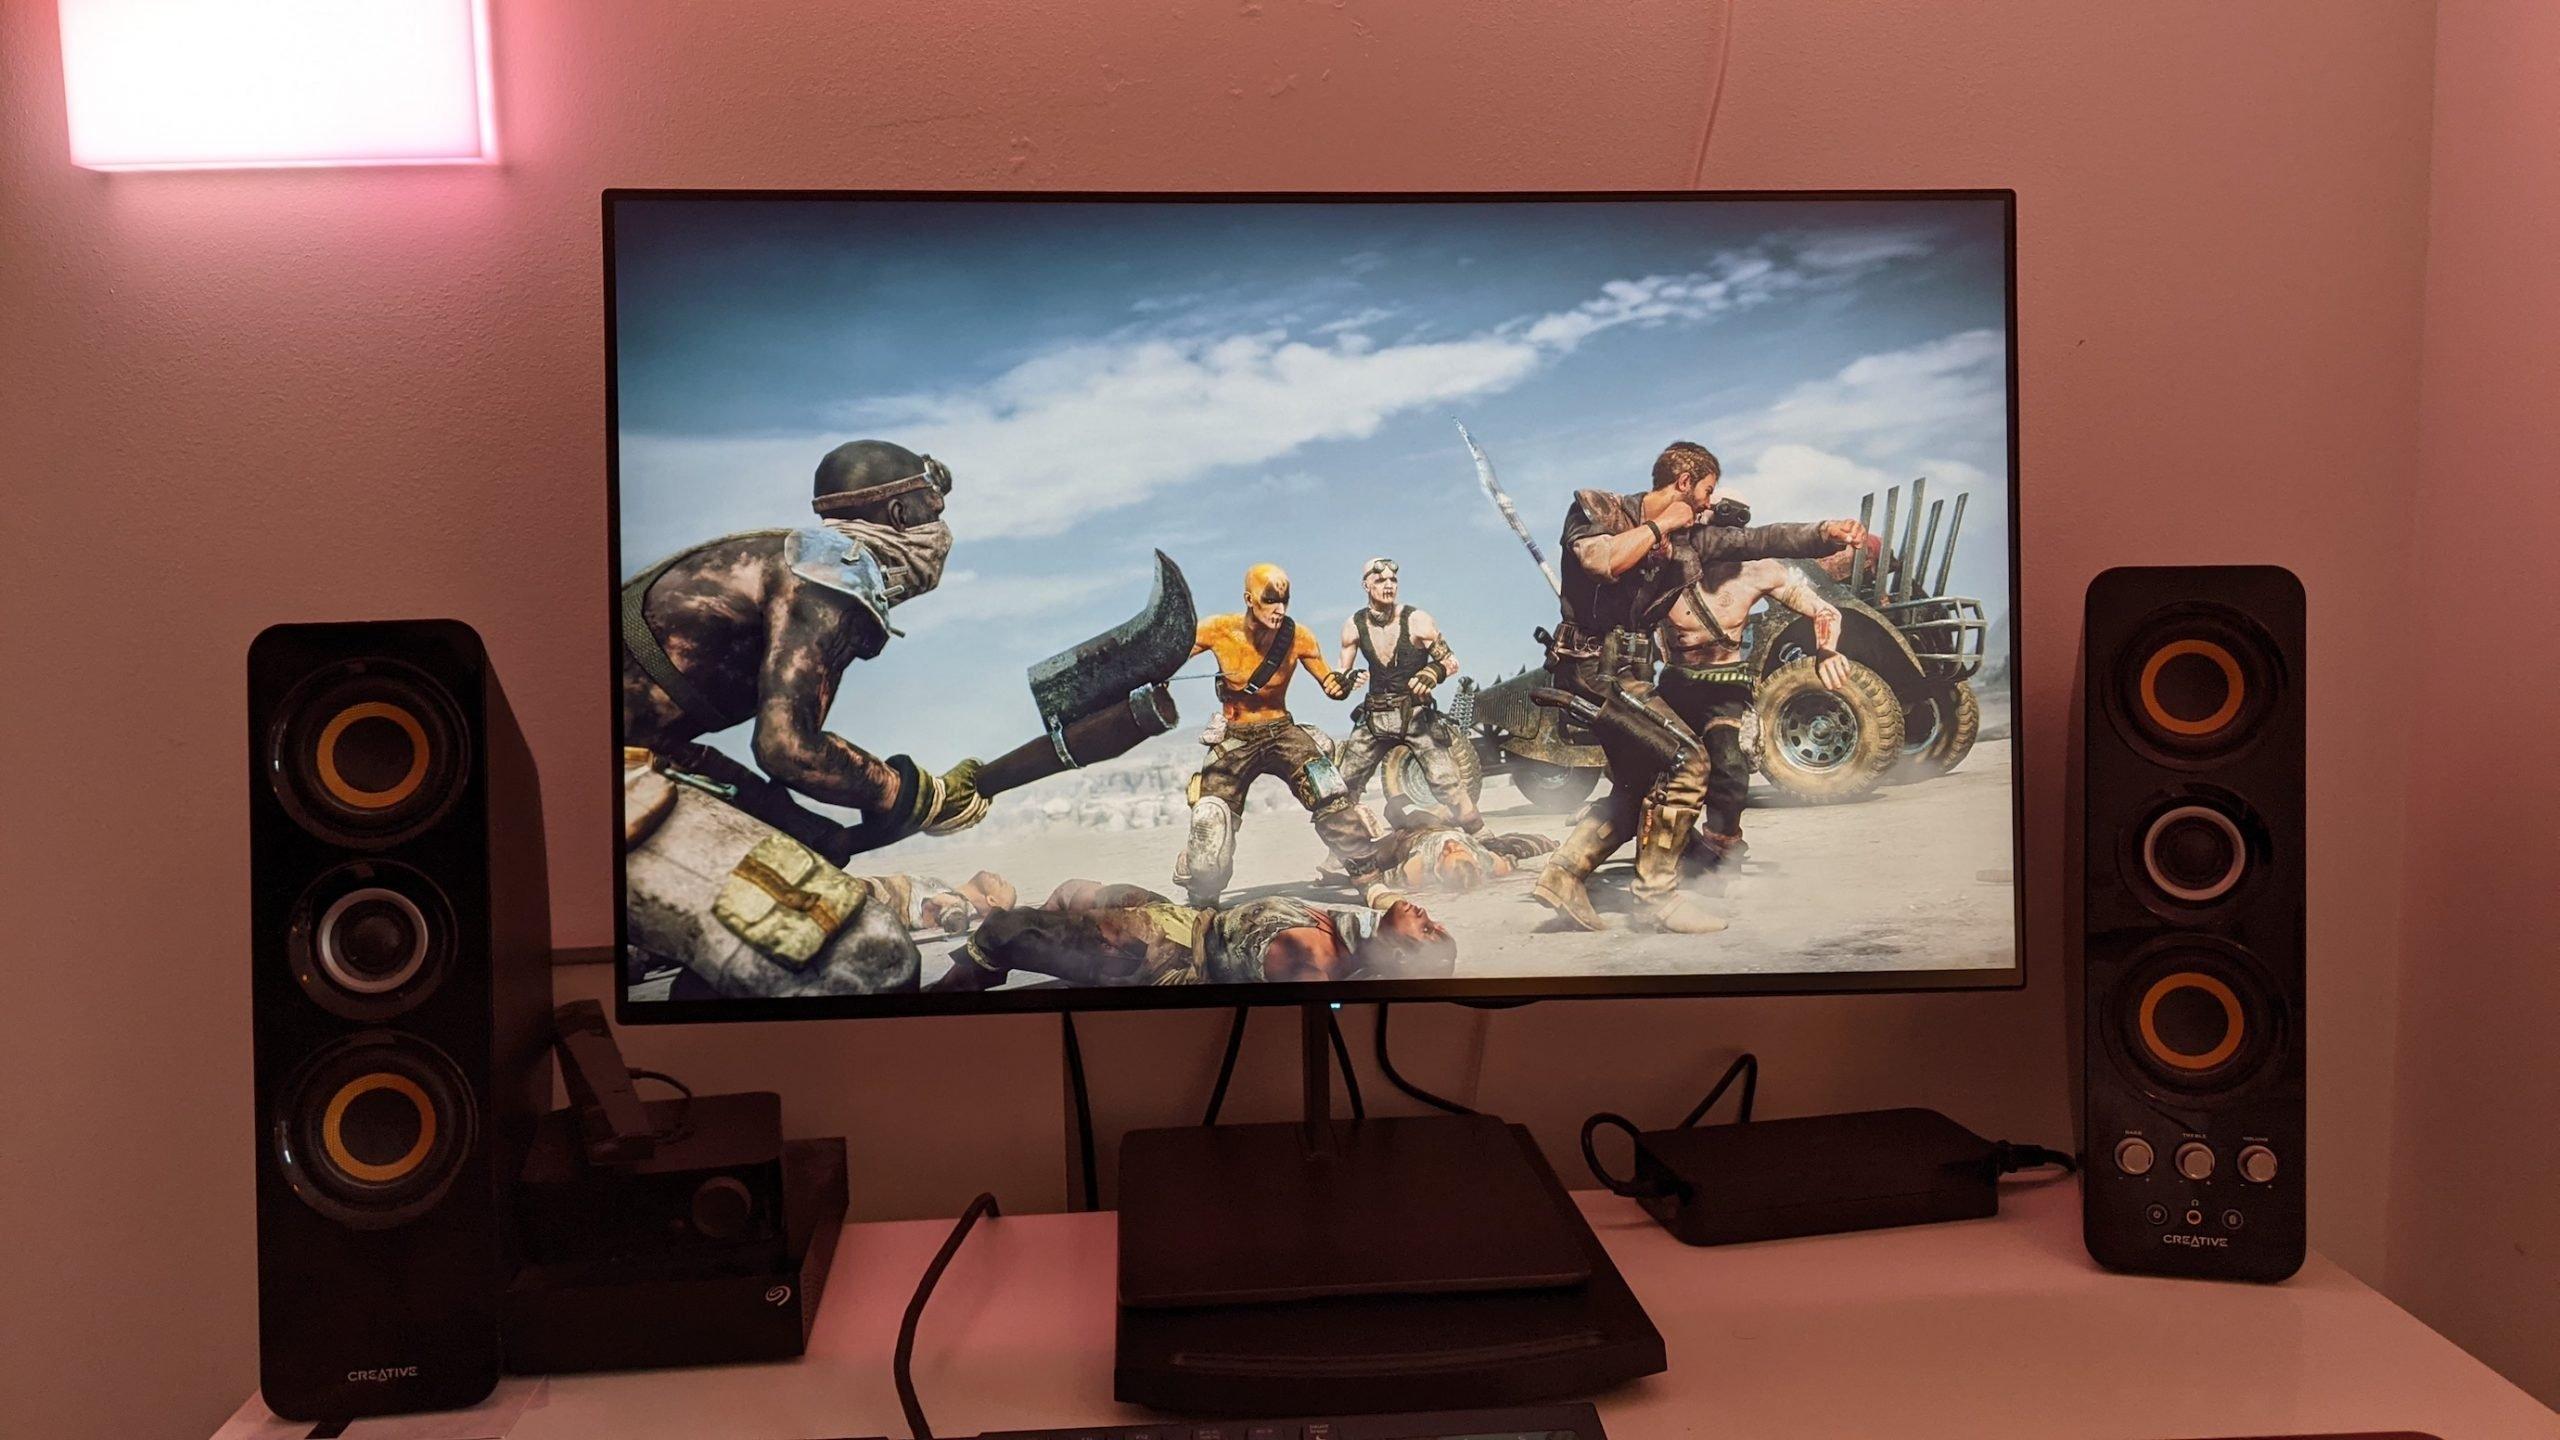 Eve Spectrum 4K 144Hz (ES07D03) monitor on a desk